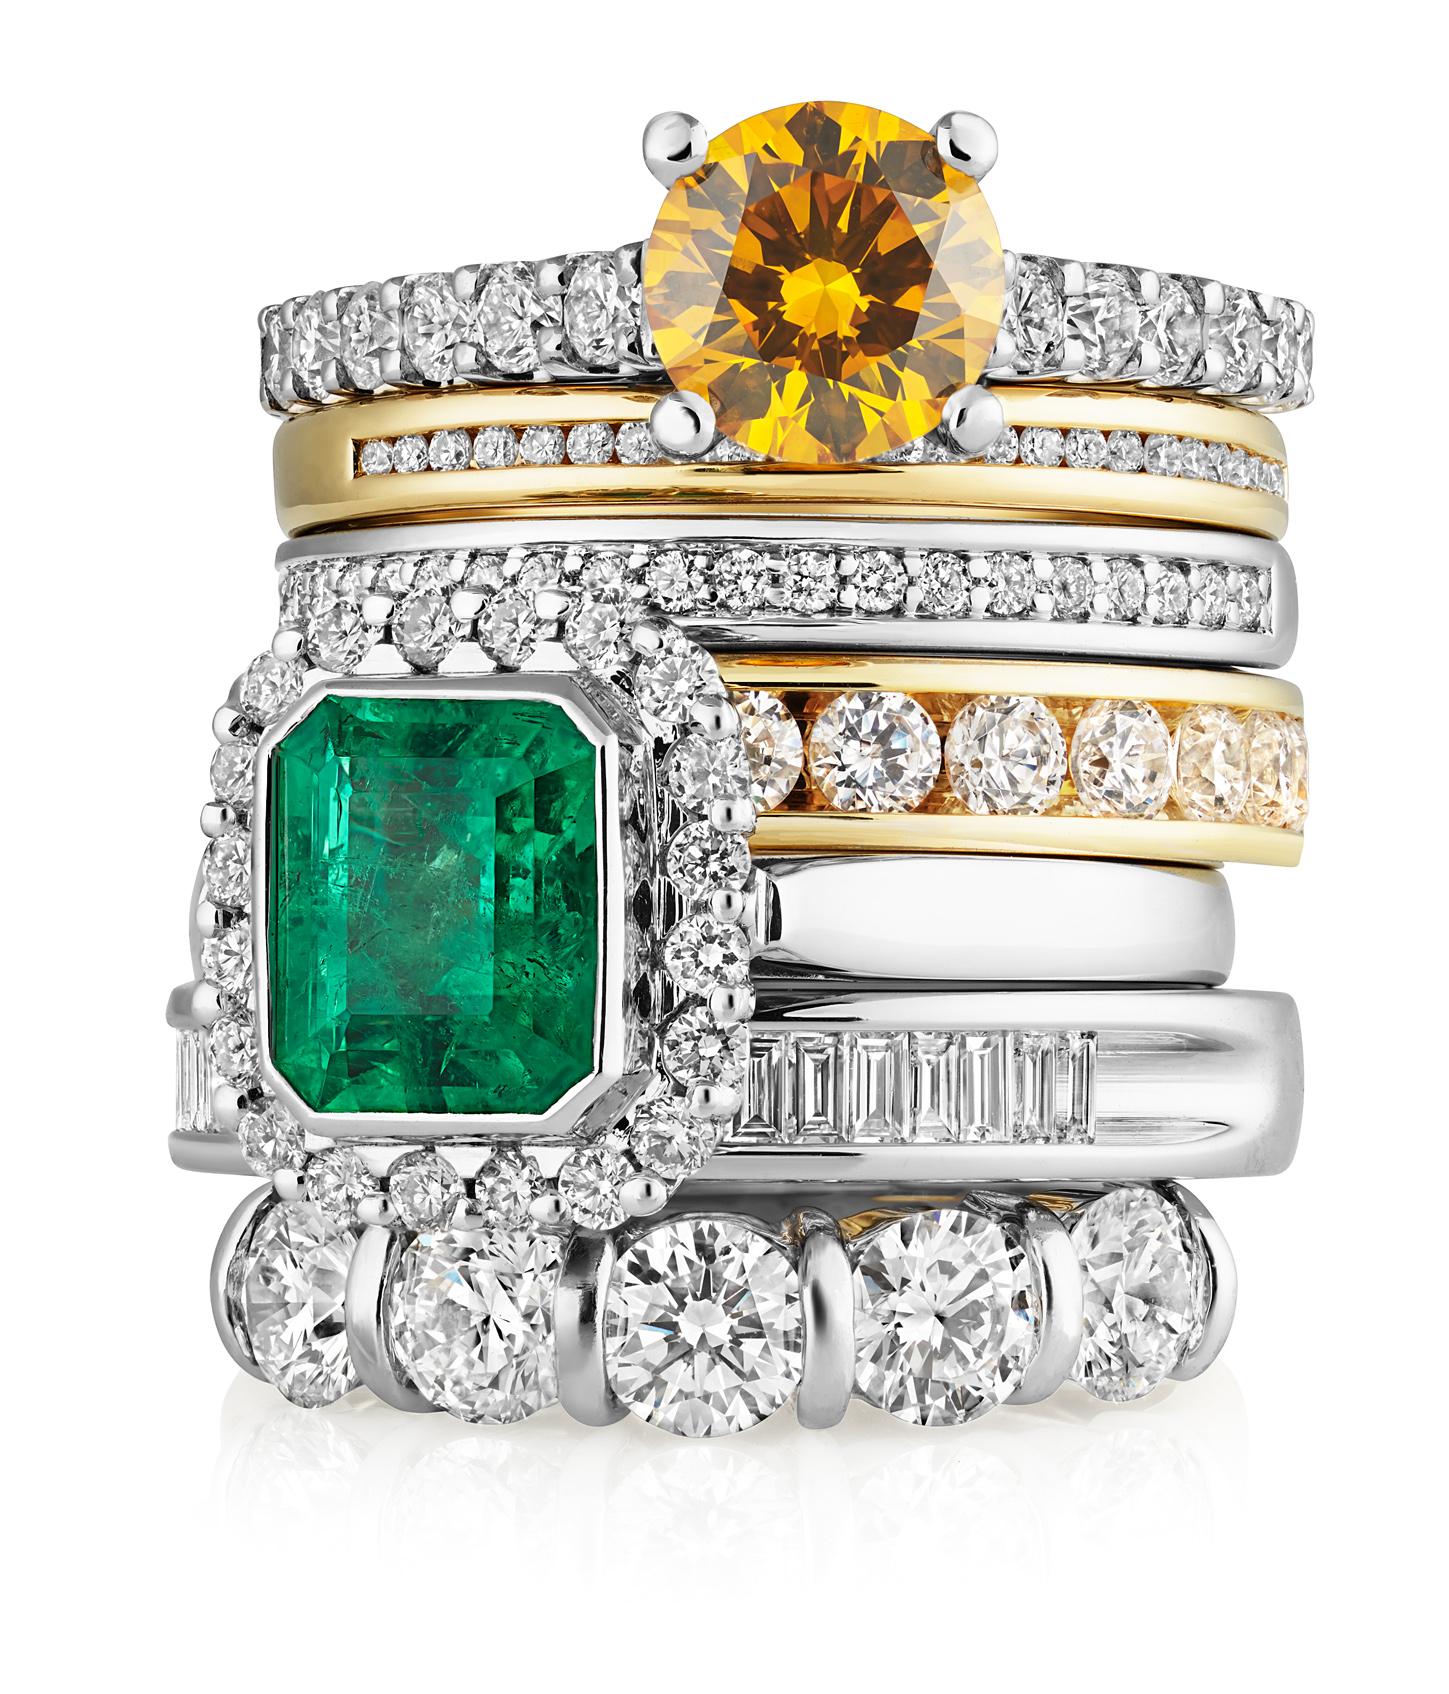 Rings that rock from Diamondology